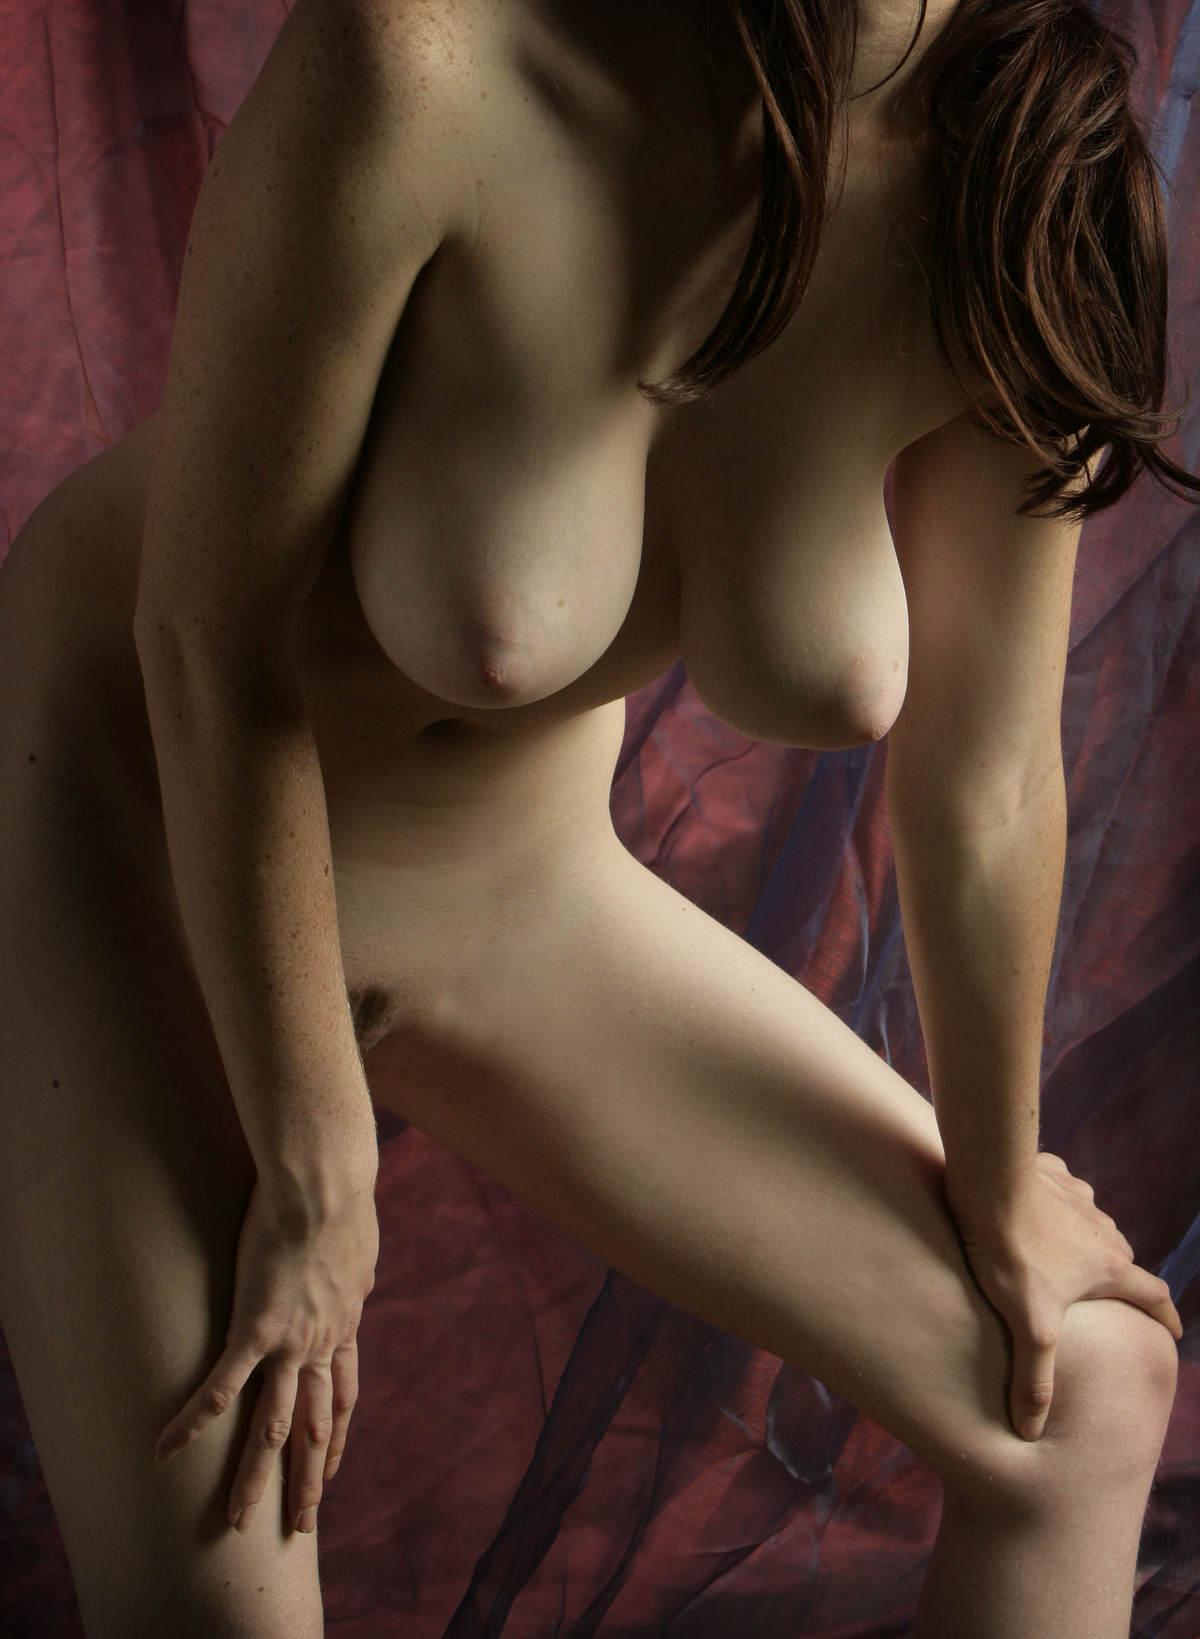 erotic cosplay